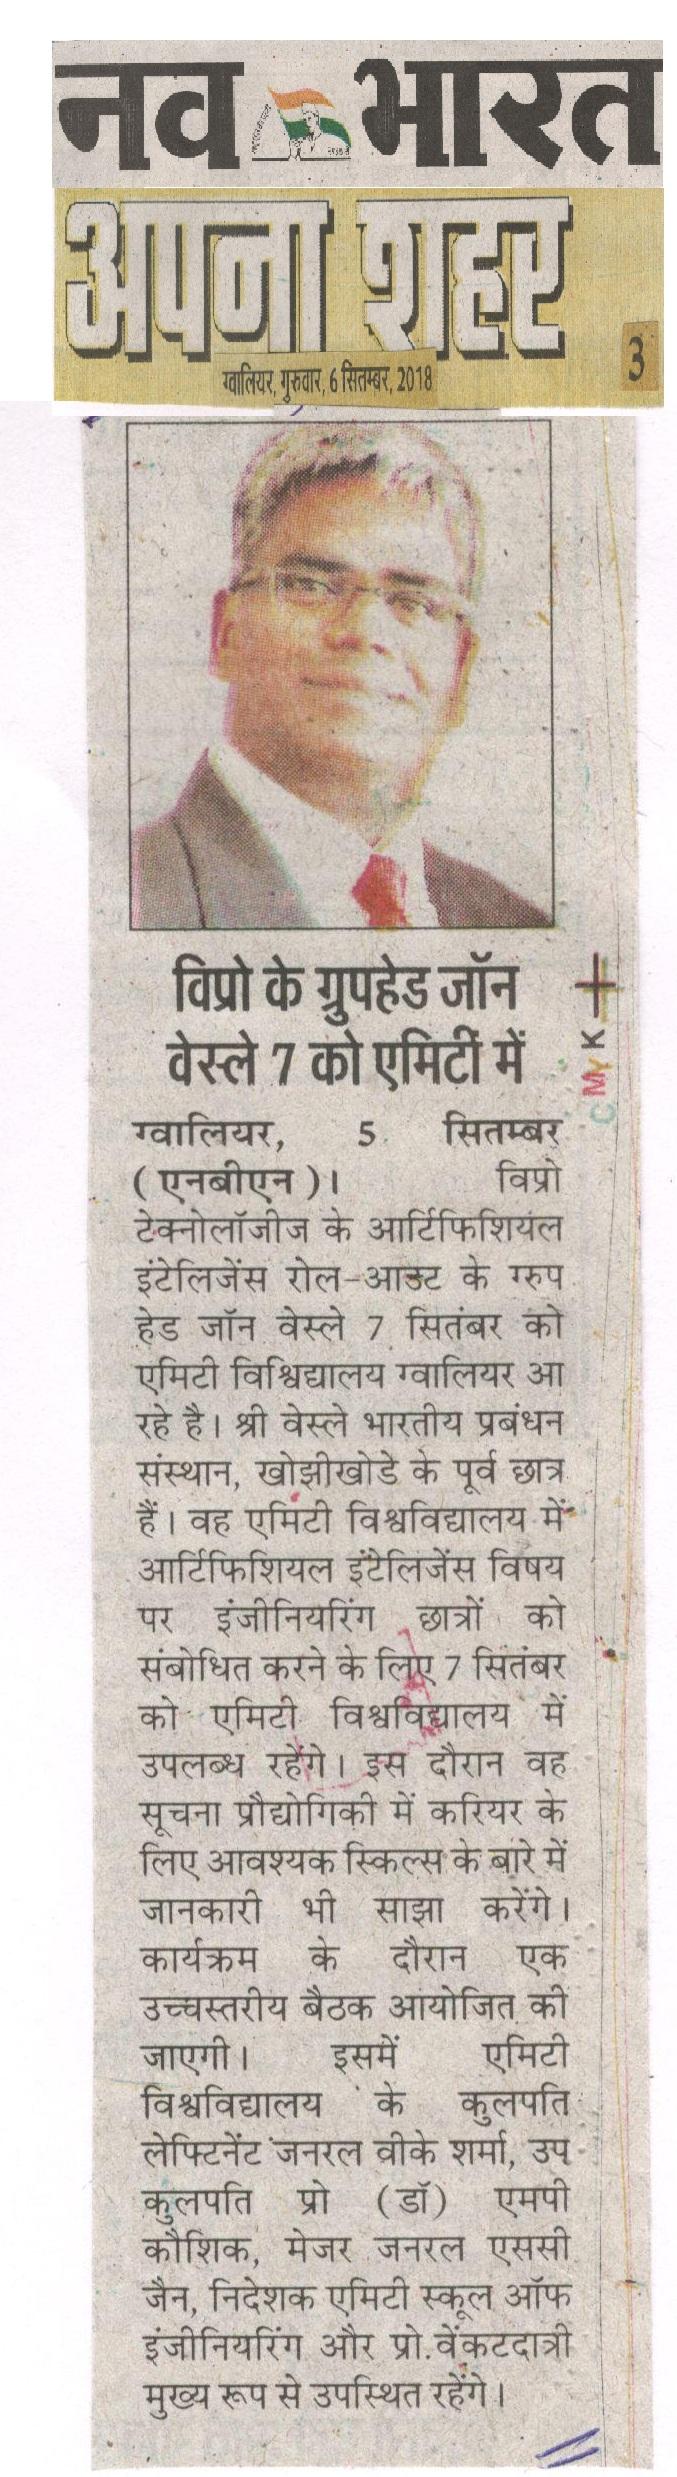 Nav Bharat-AUMP-ASET-Visit of Wipro Group Head-Amity